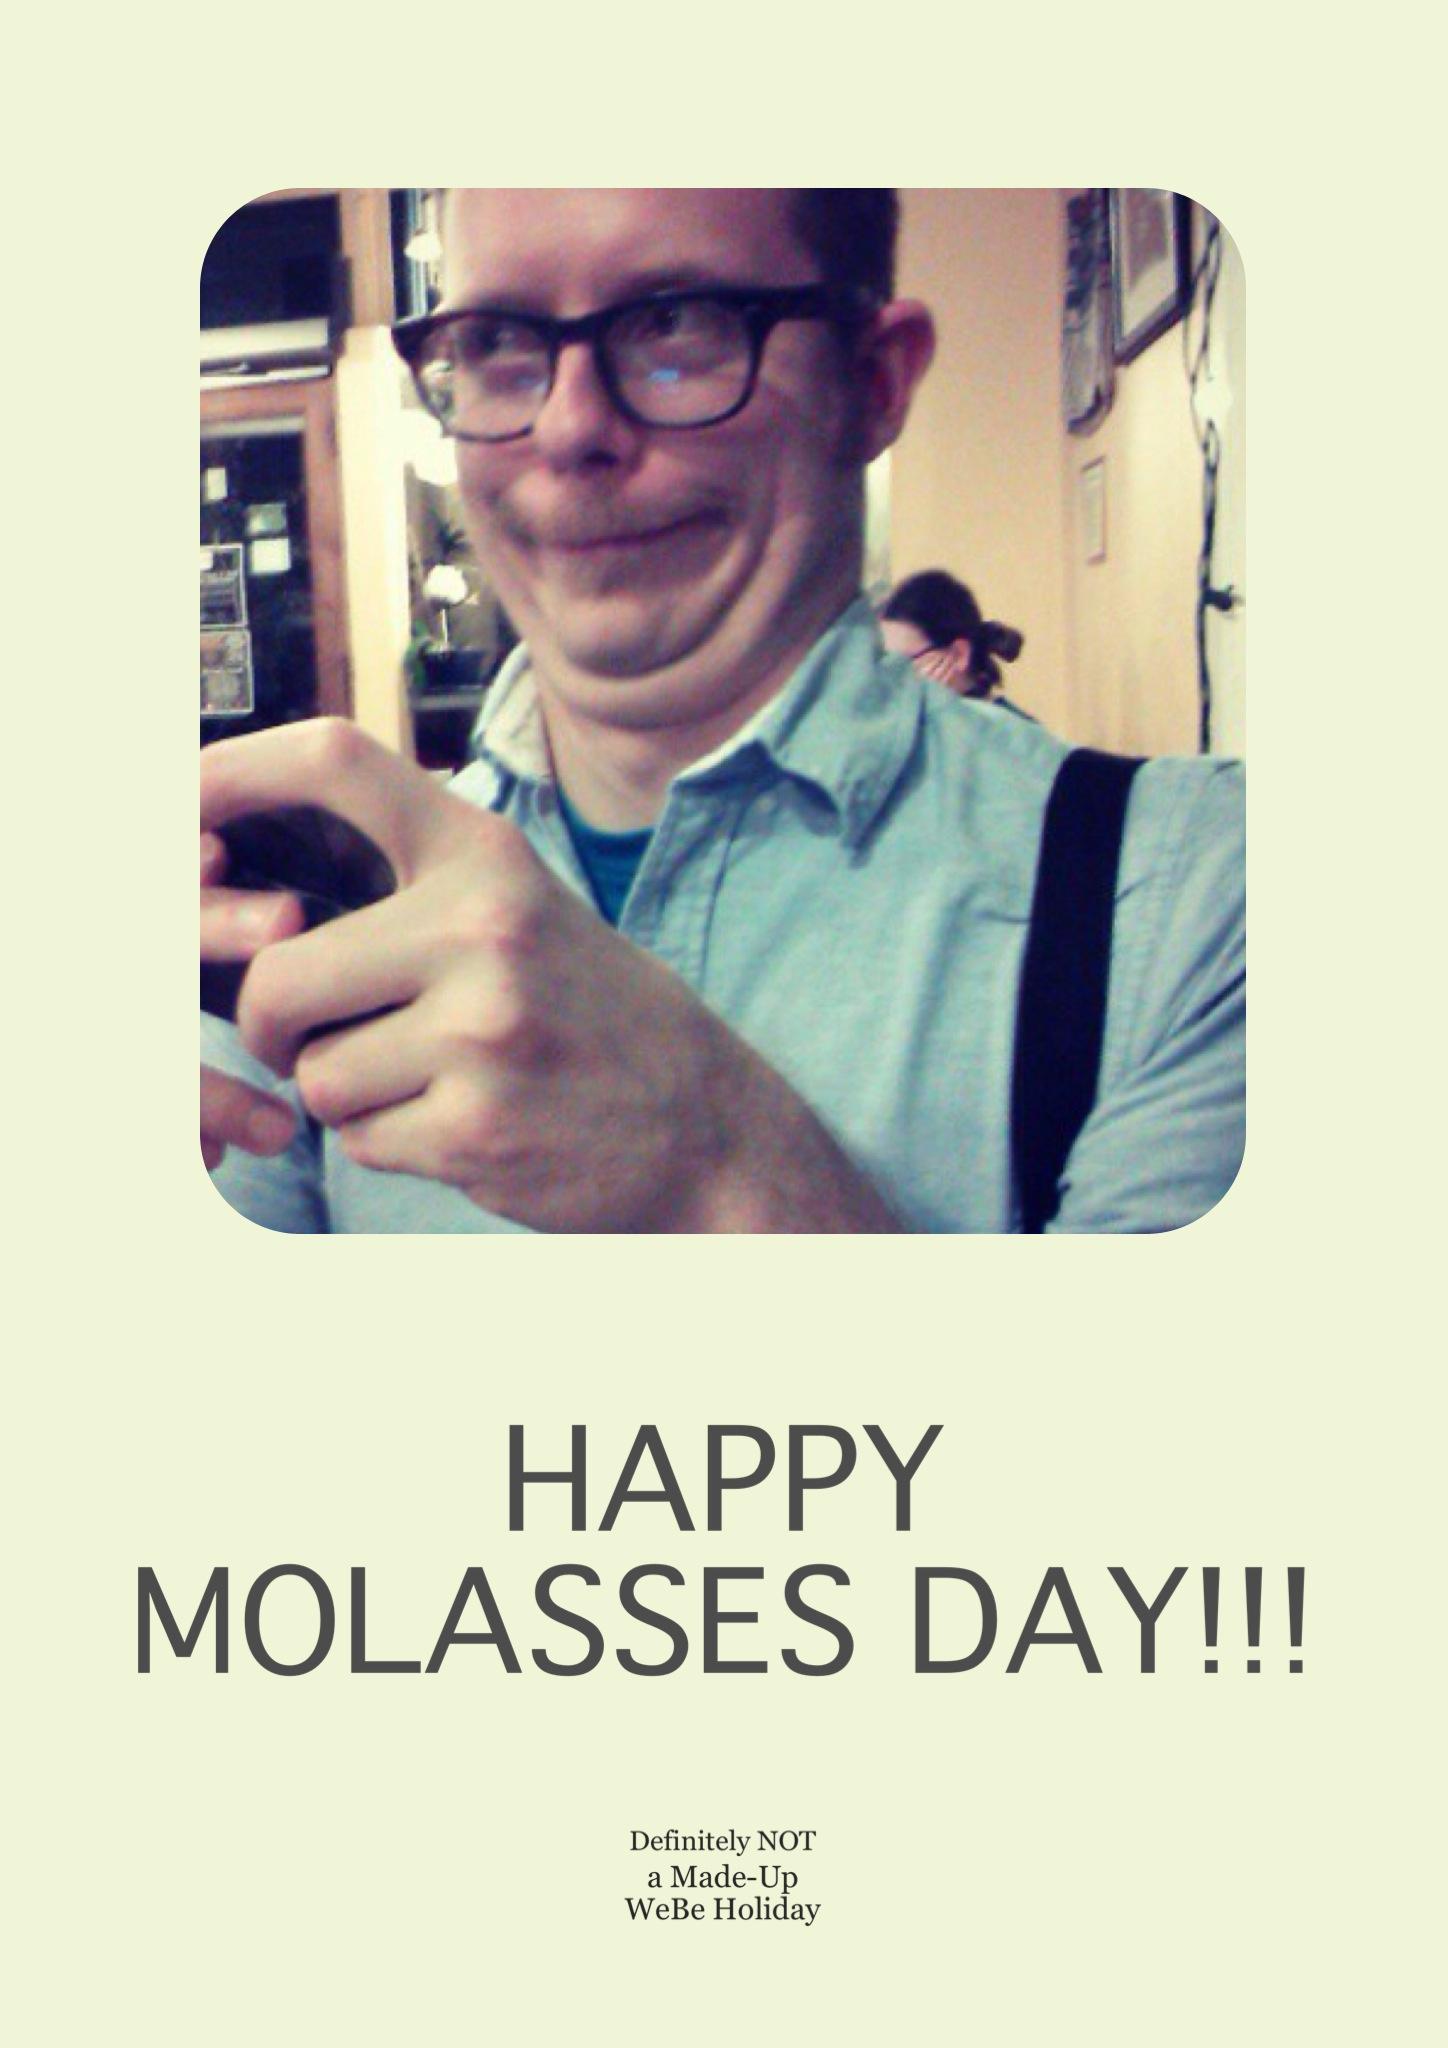 Molasses Day 2013 - Jason 01.jpg